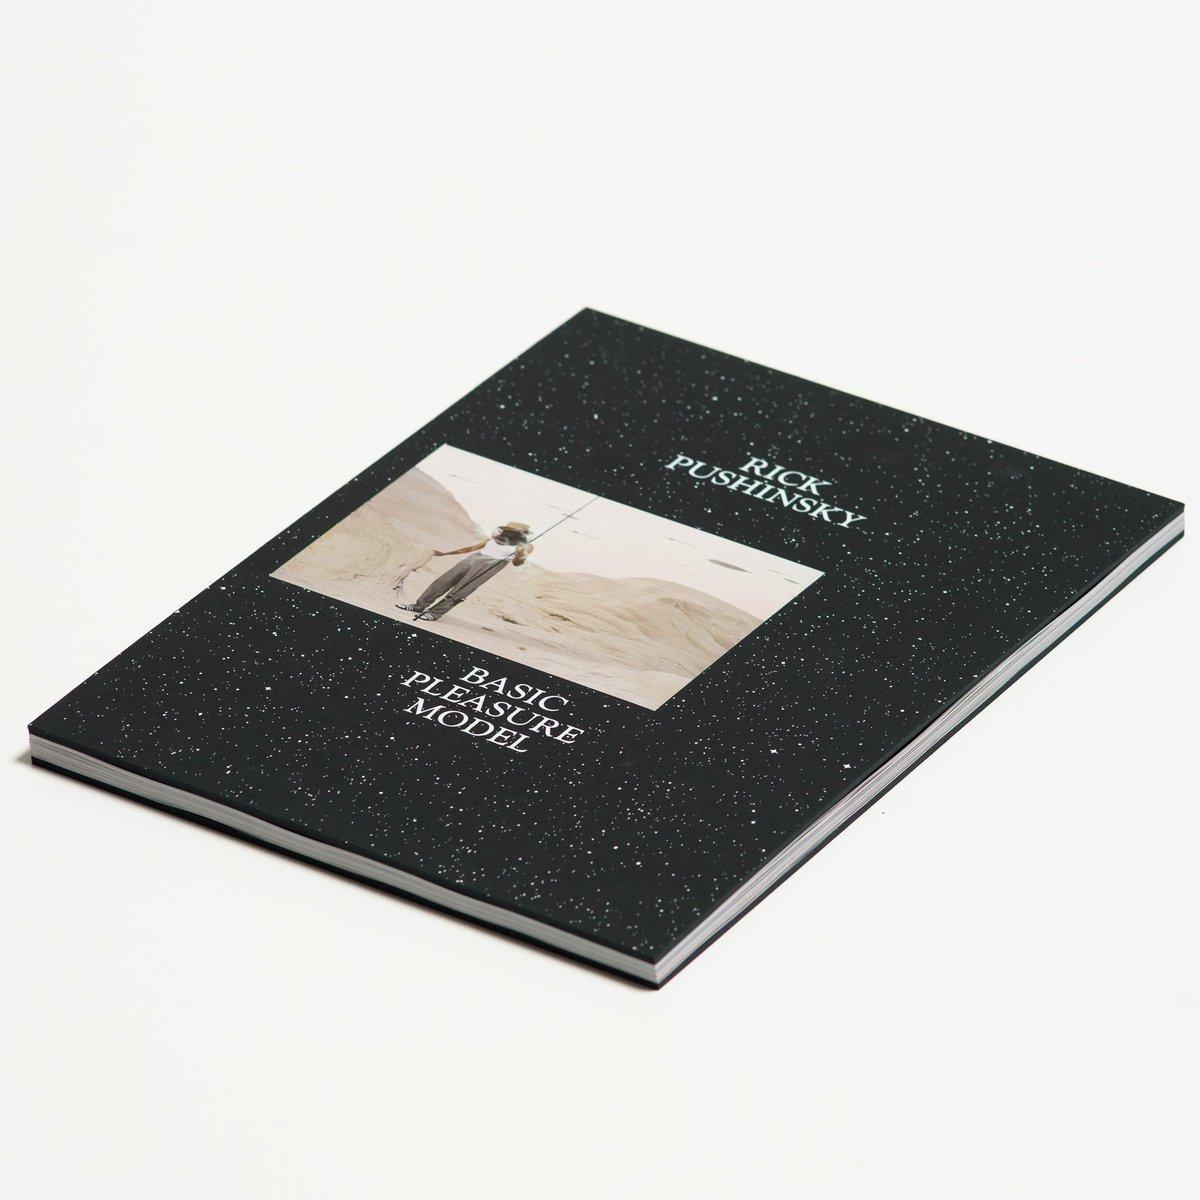 New book by @RickPushinsky called Basic Pleasure Model using Sumo Black 3mm from @favini_en on the cover. Read more here... …mazingworldatfennerpaper.blogspot.com/2019/09/basic-…